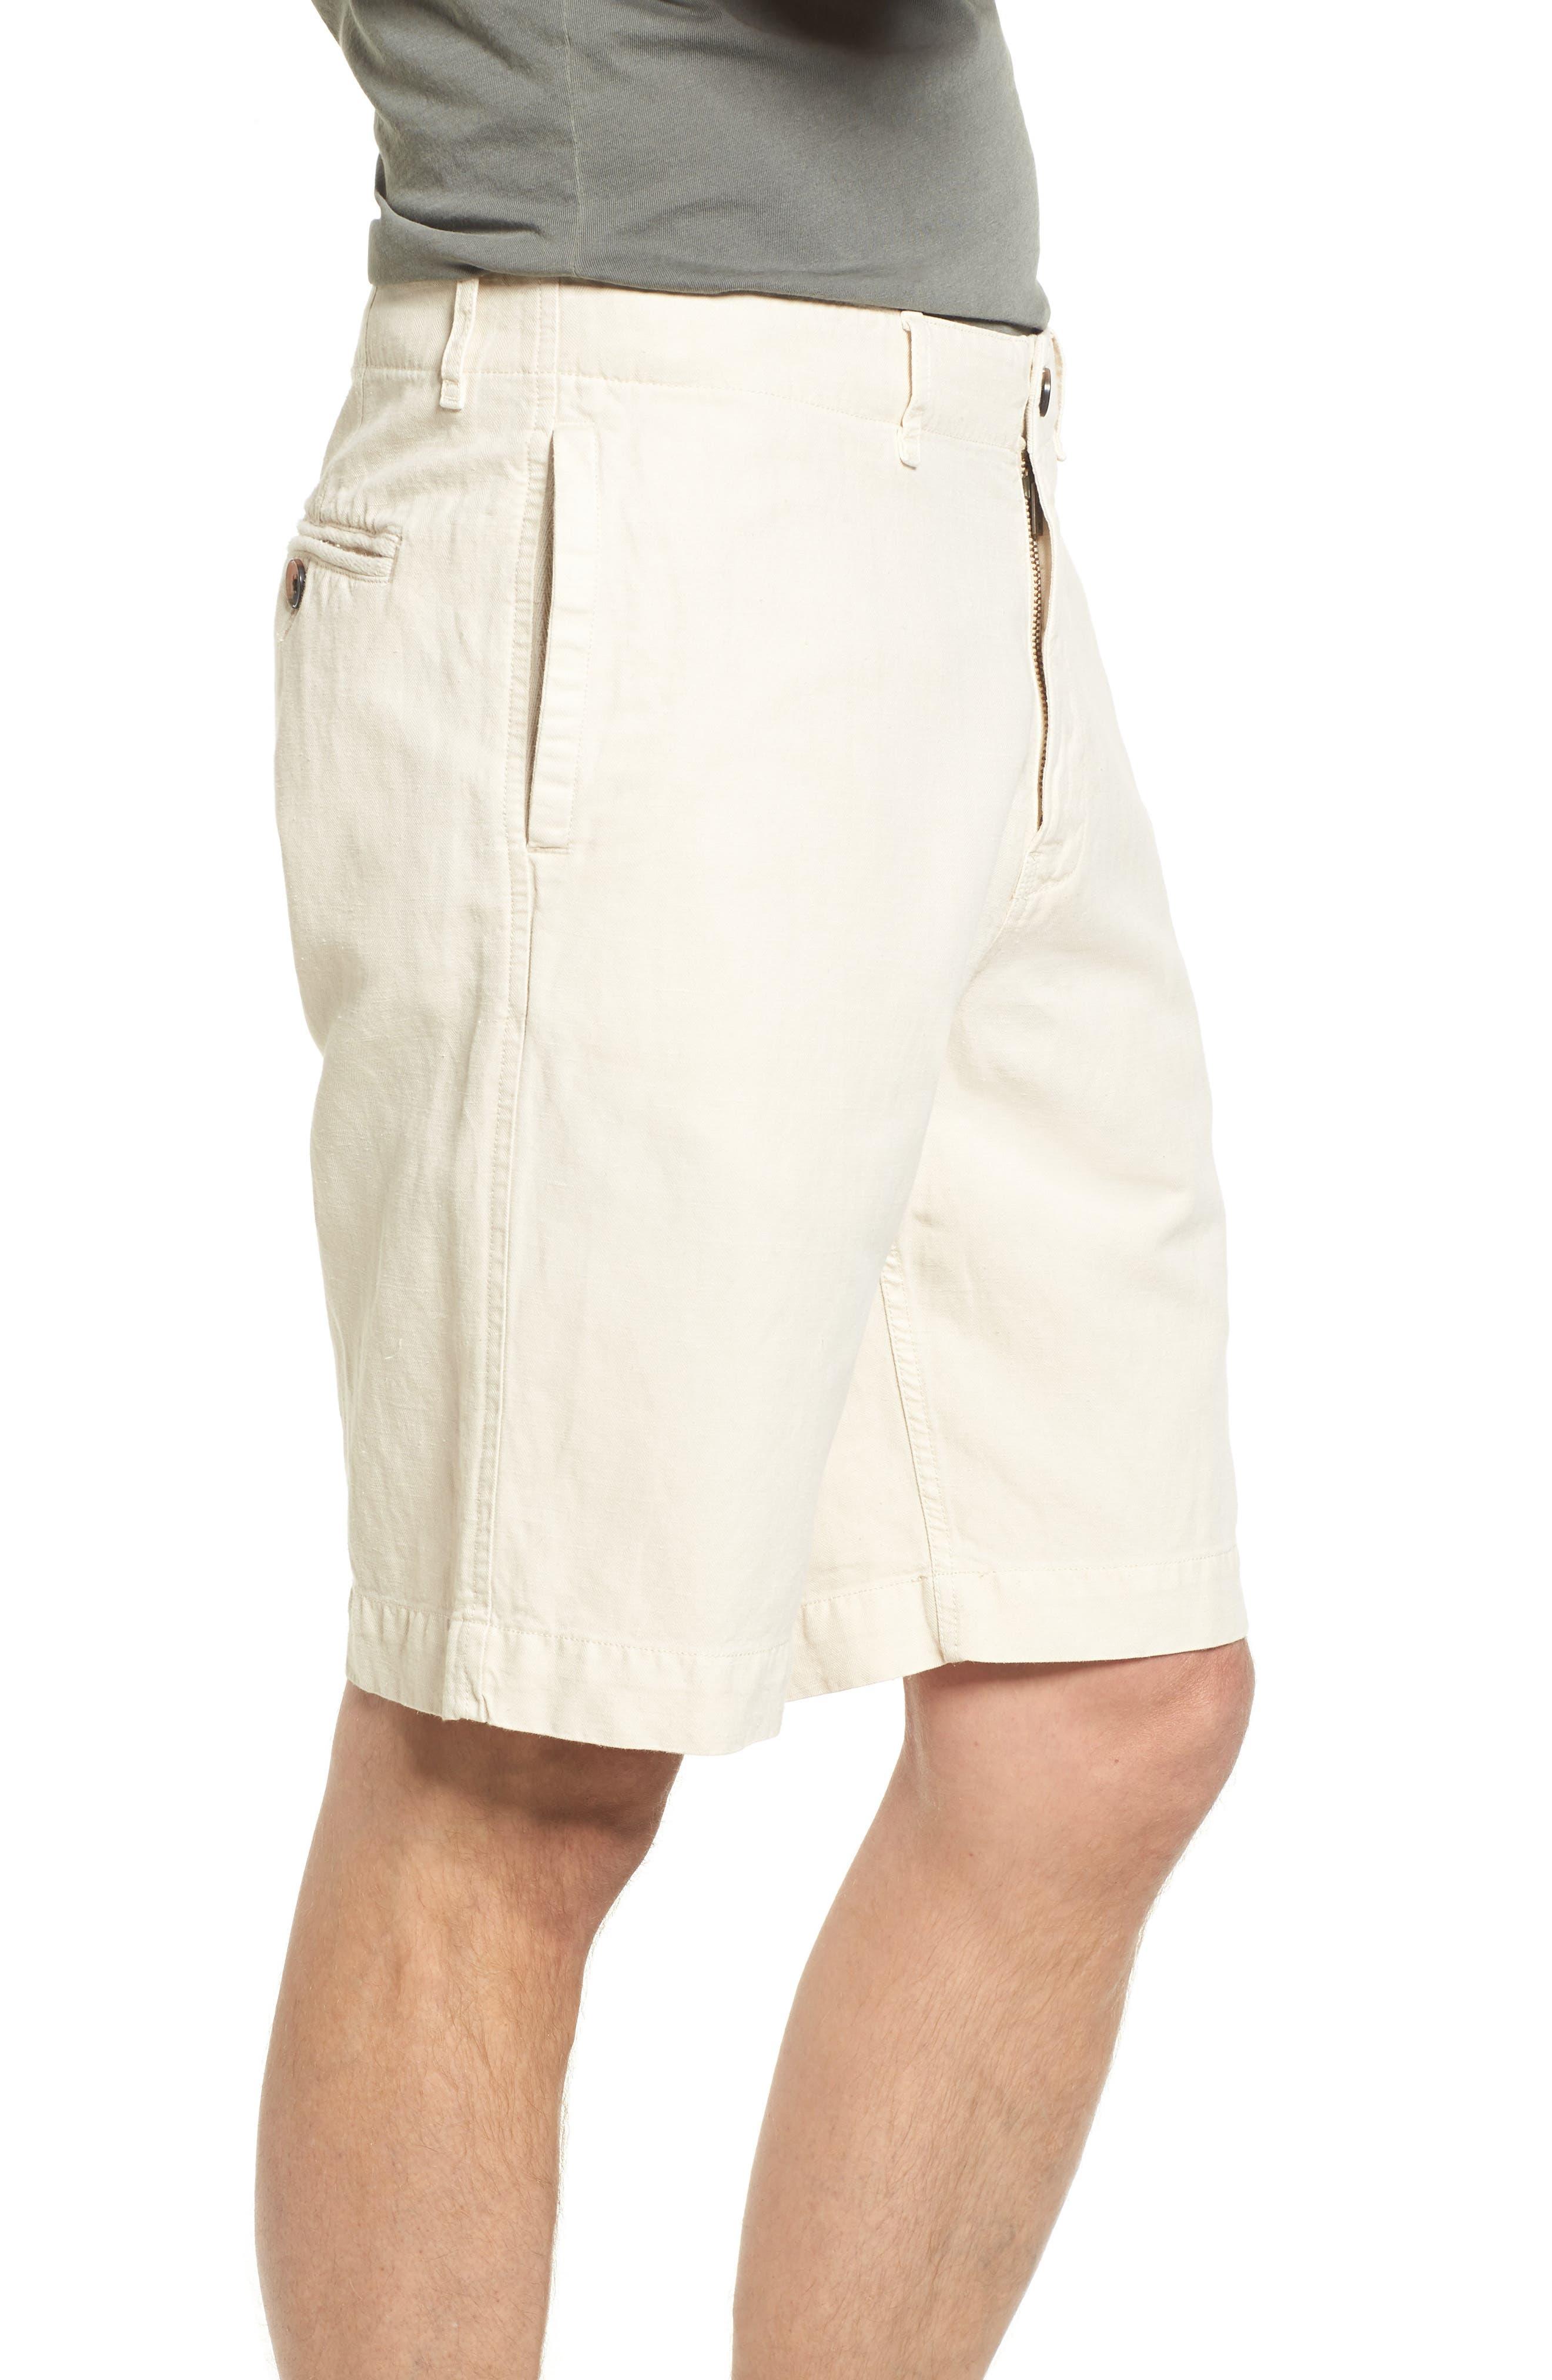 Clyde Cotton & Linen Shorts,                             Alternate thumbnail 3, color,                             EGGSHELL